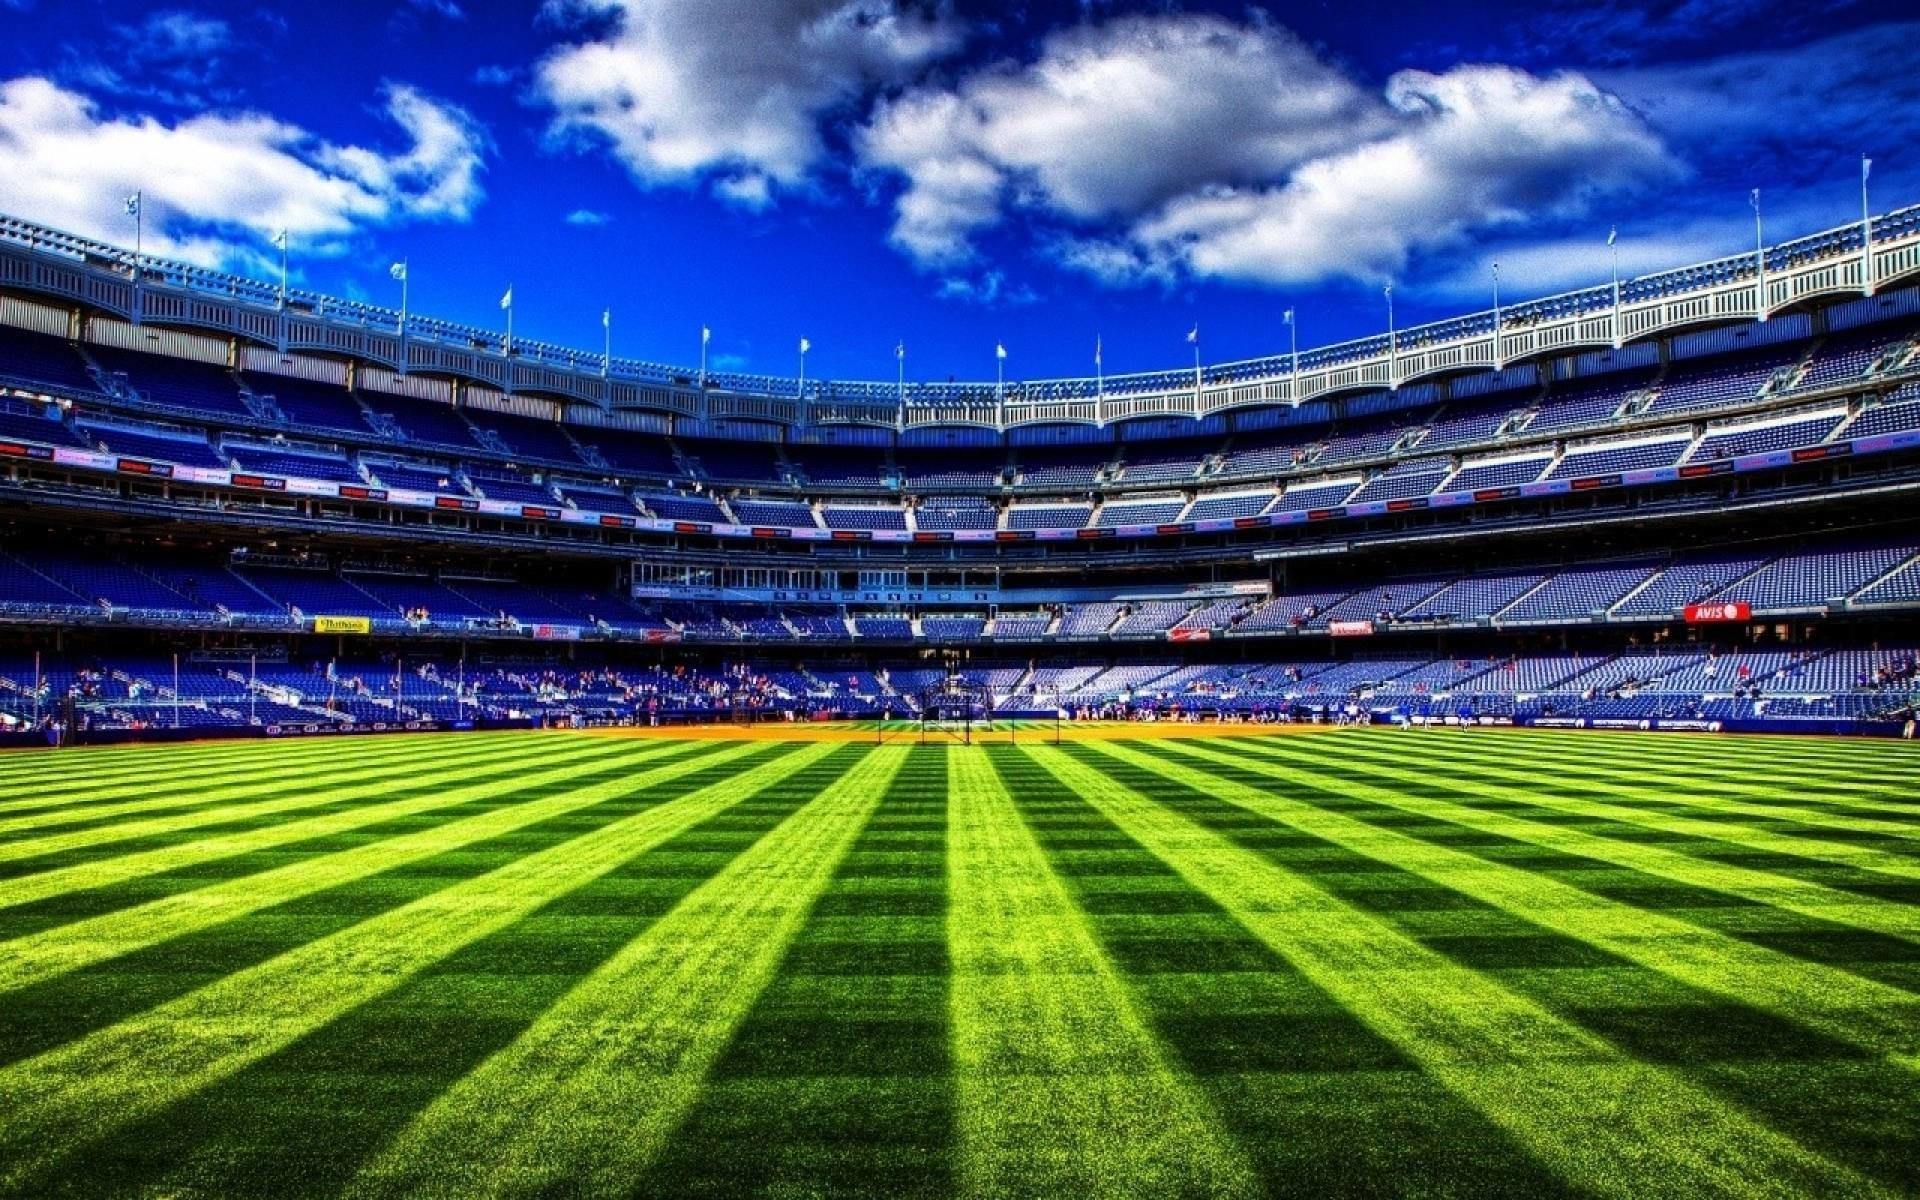 Stadium Wallpapers – Full HD wallpaper search